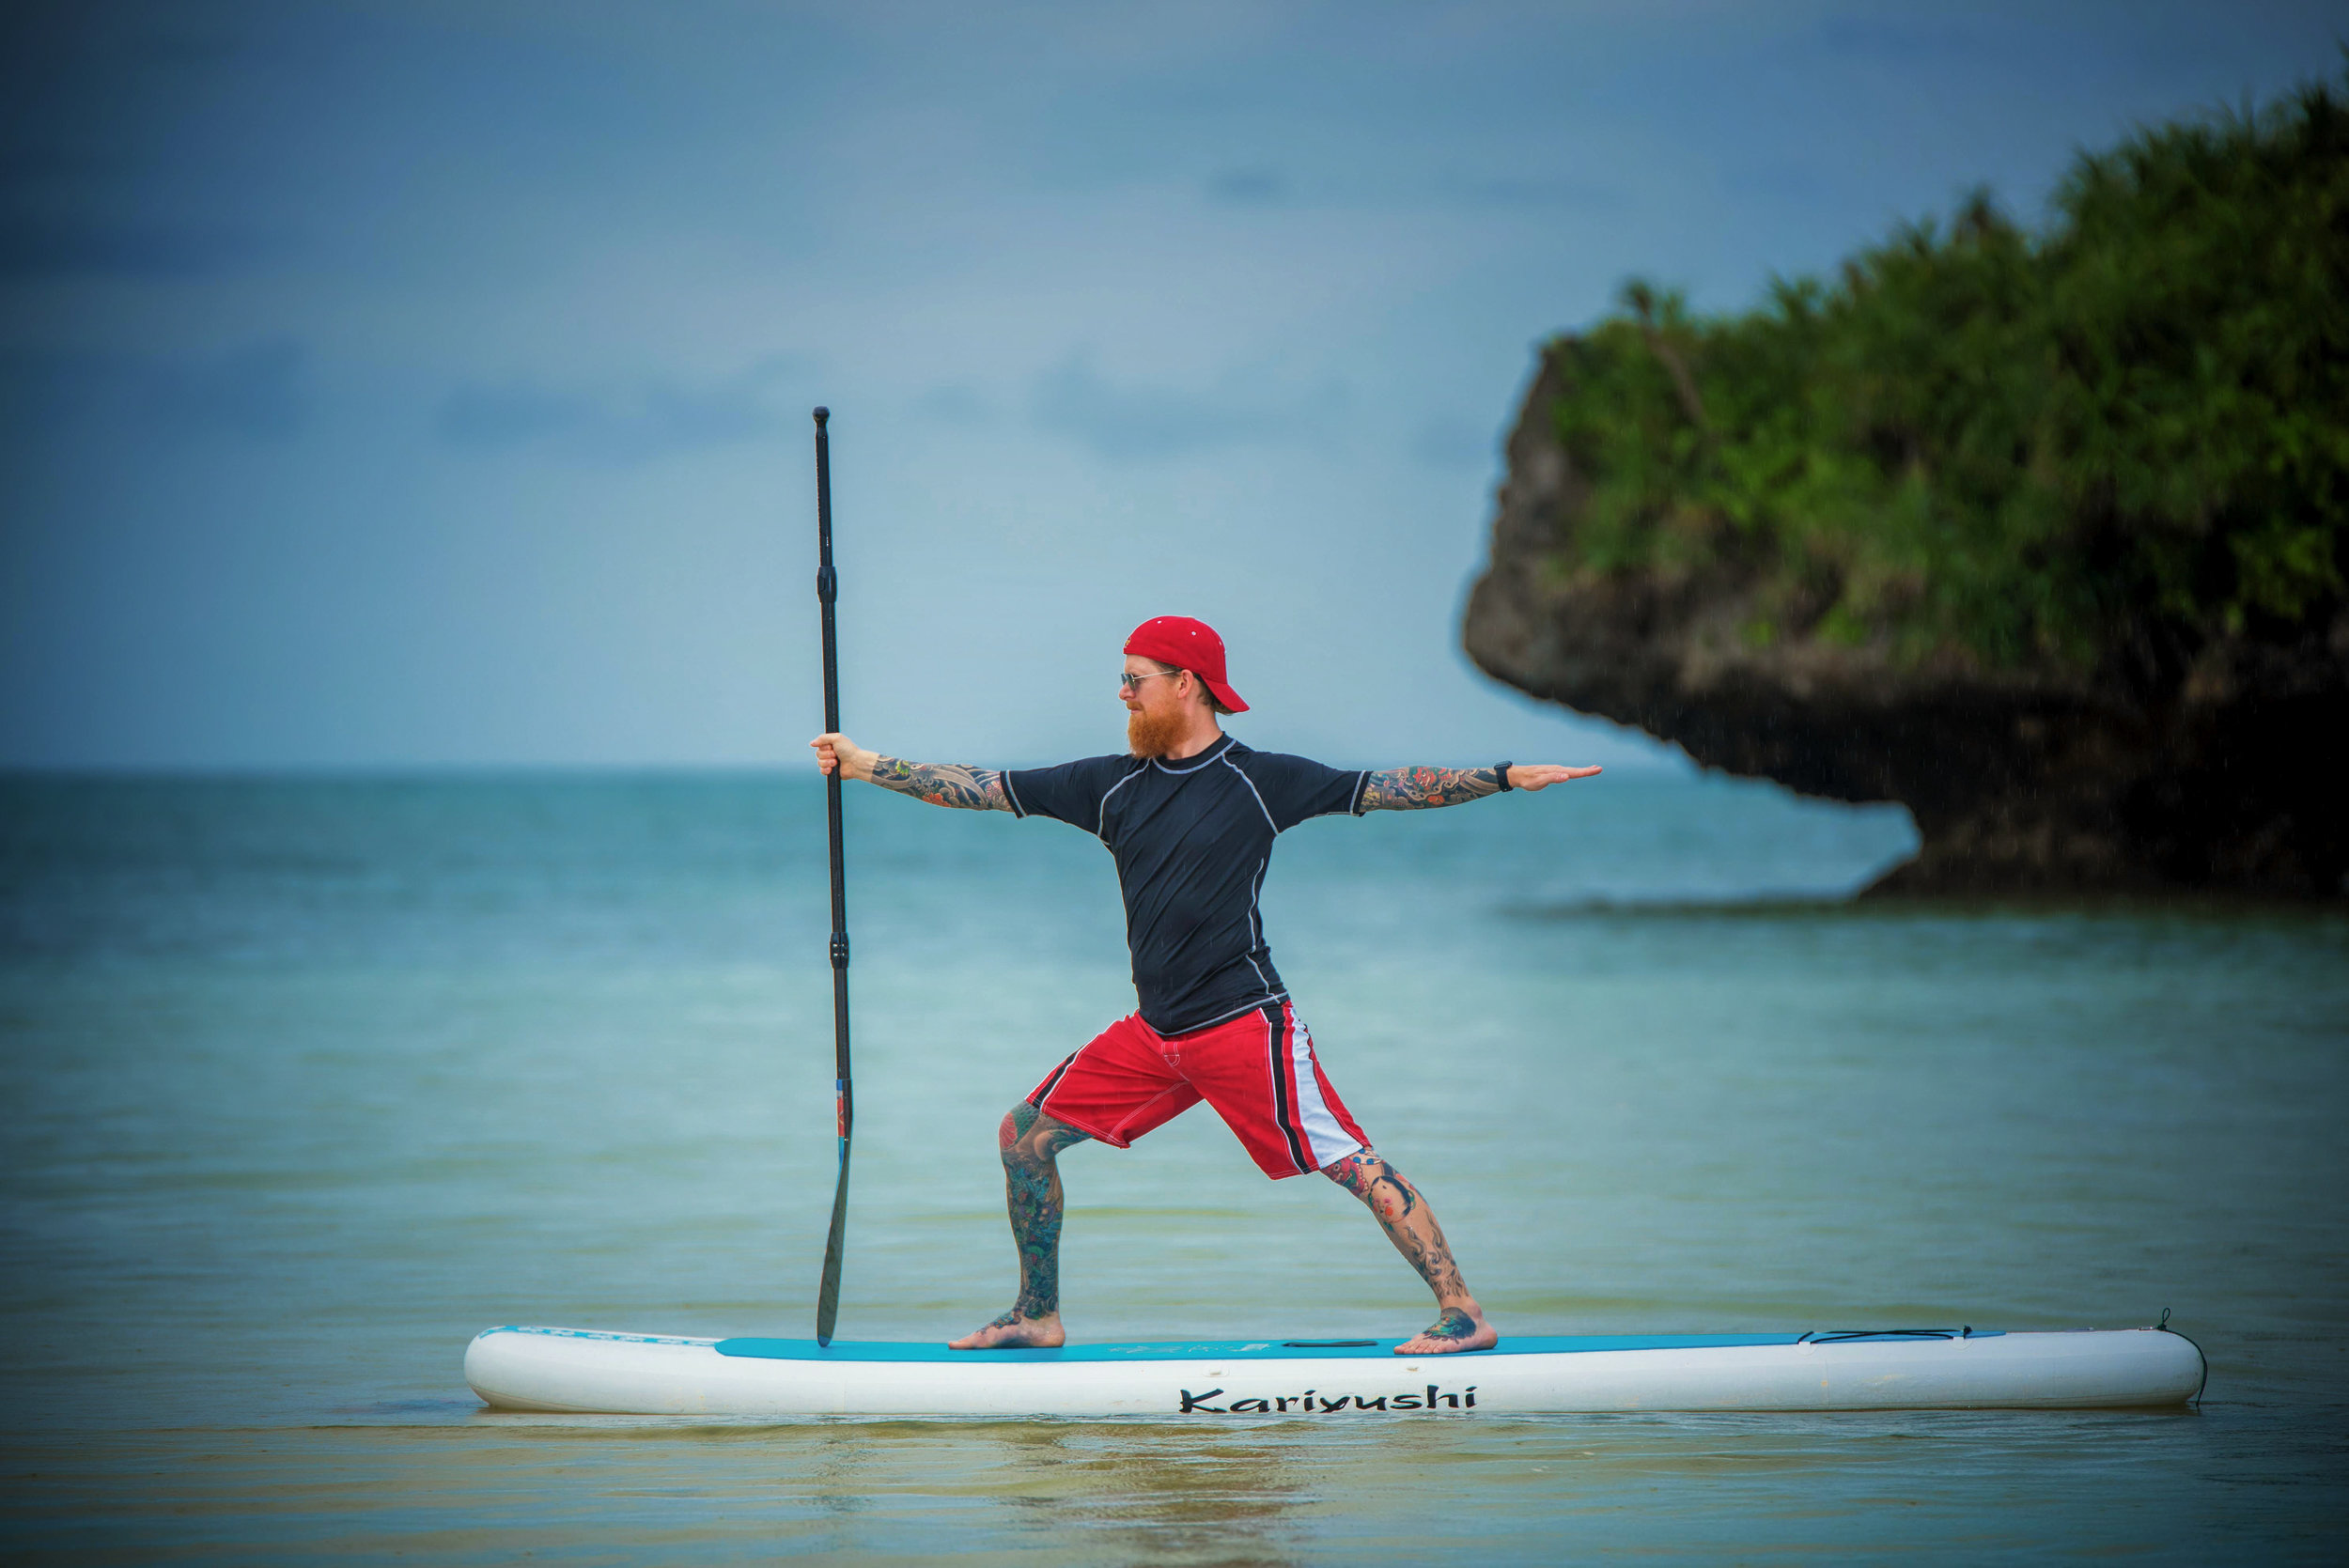 016 - Warrior 2  Paddle.jpg